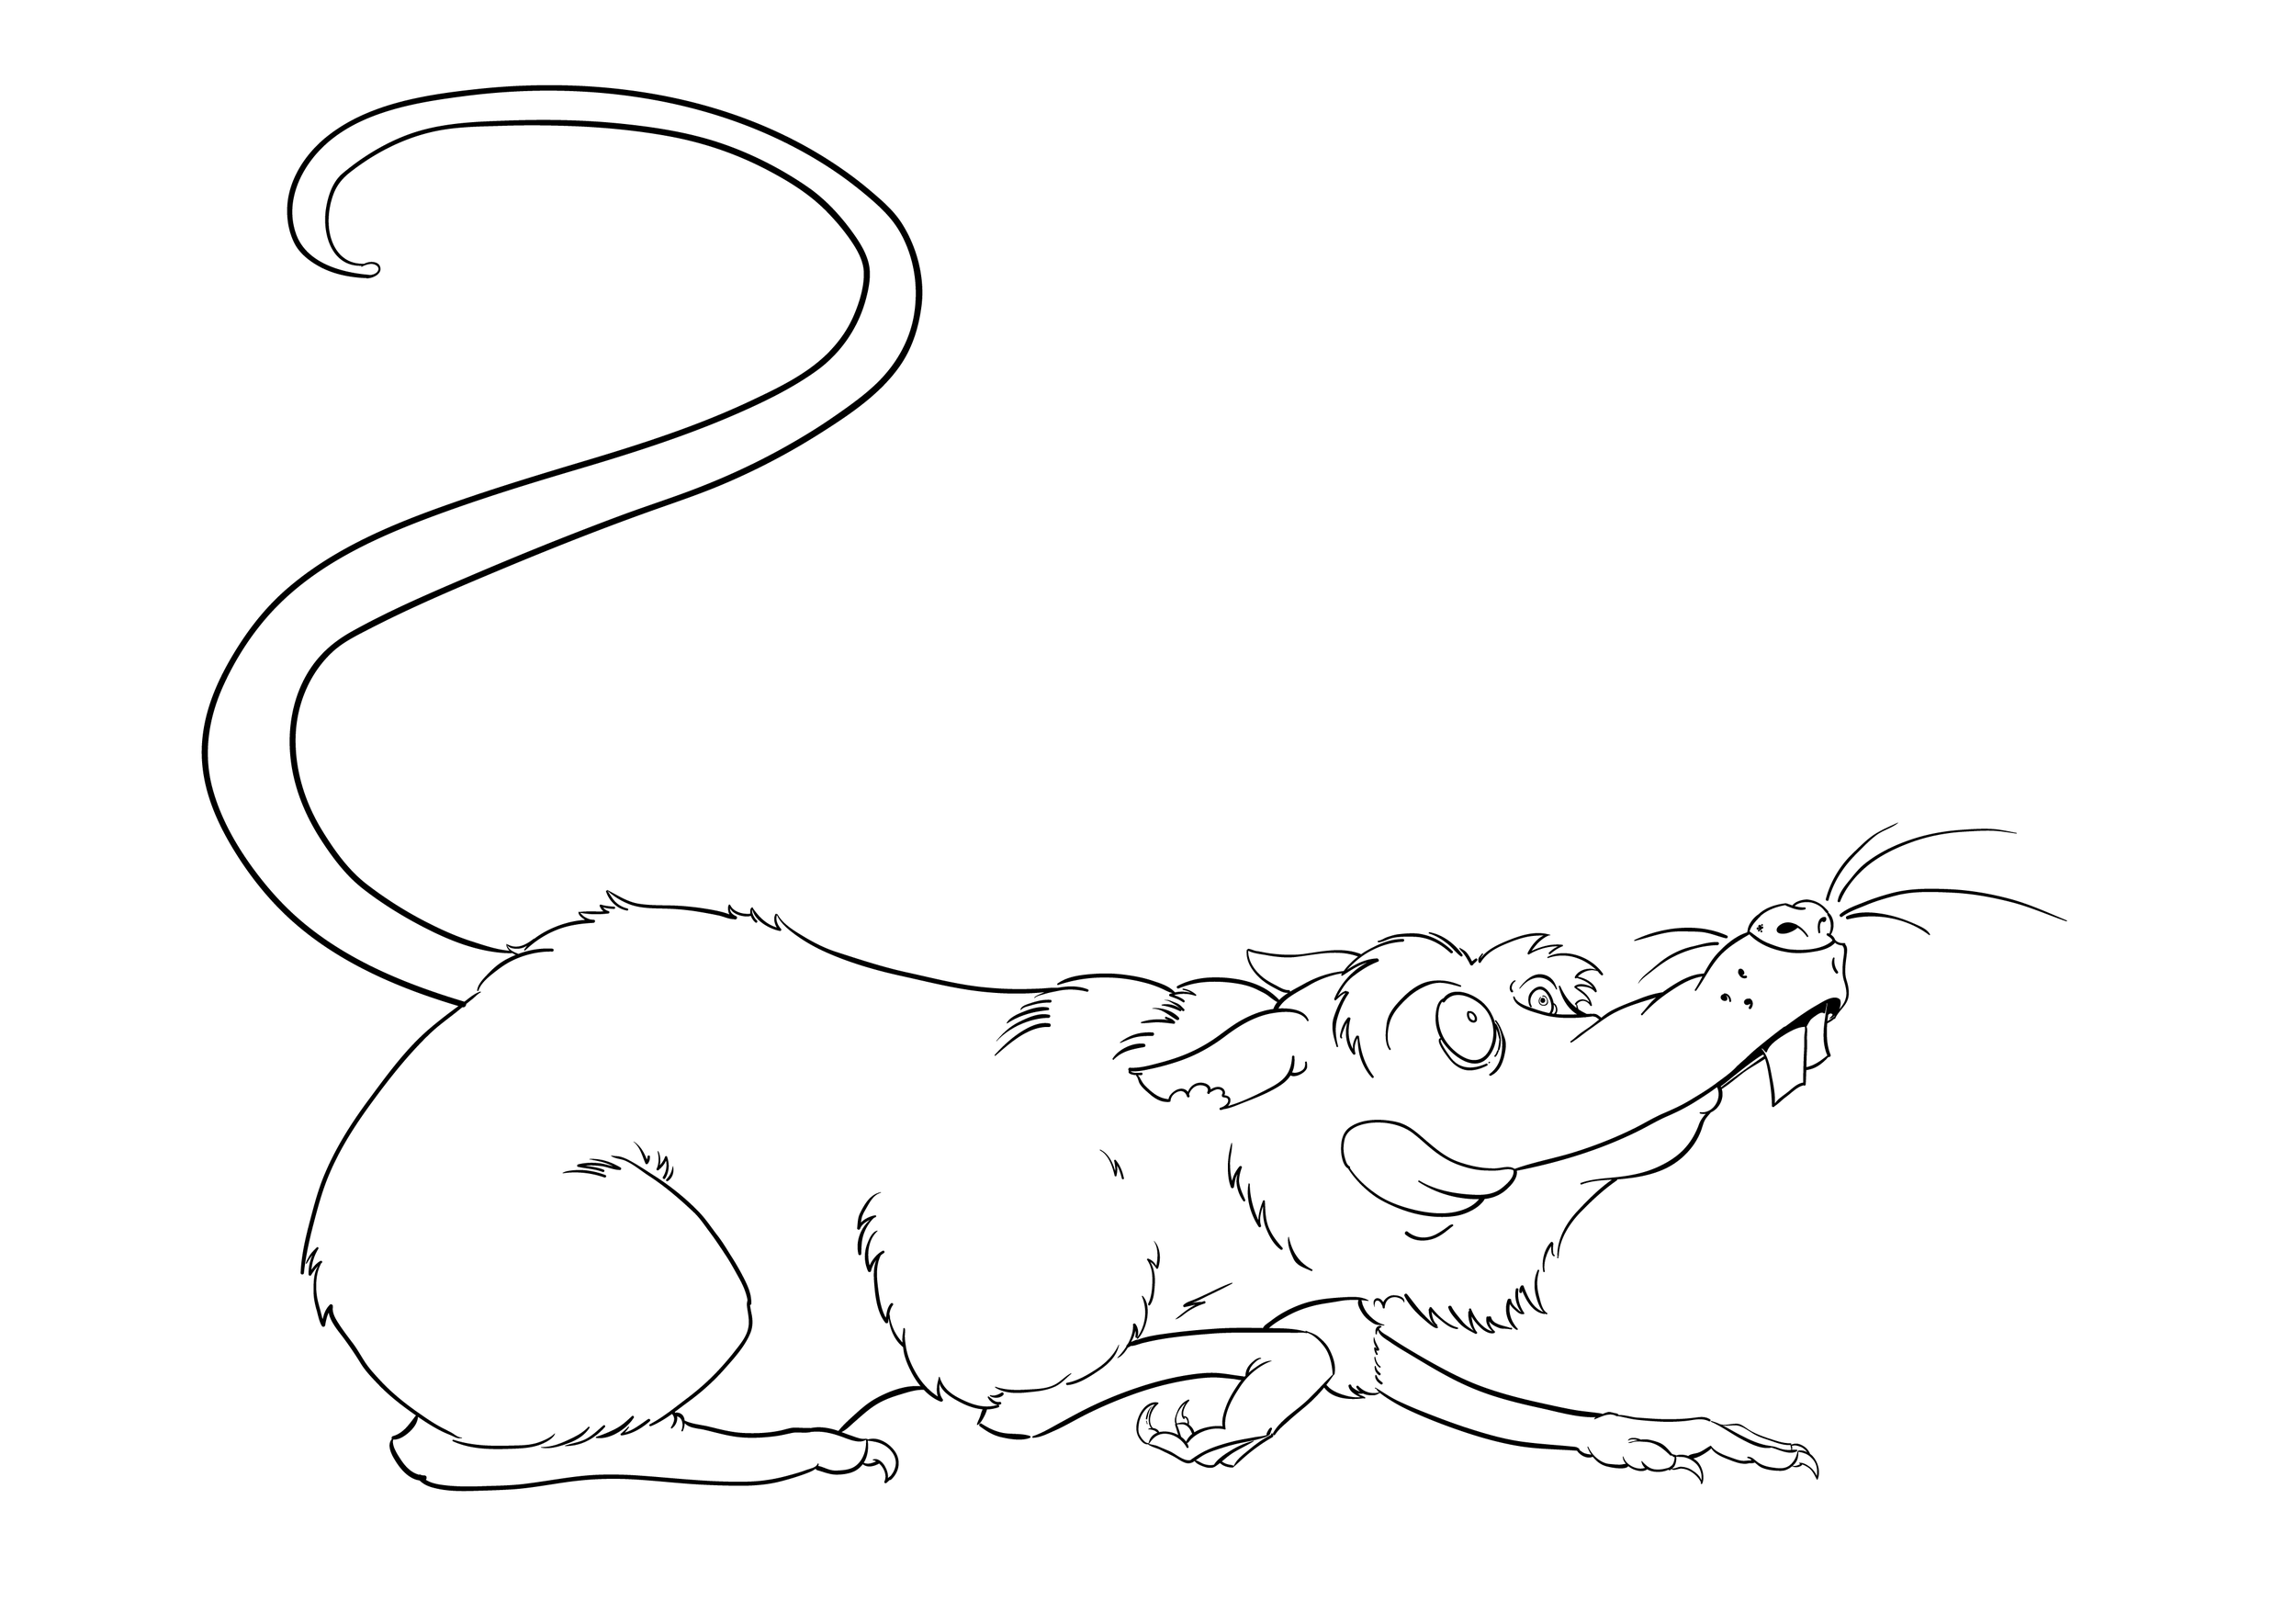 Crouching Ratt ink process